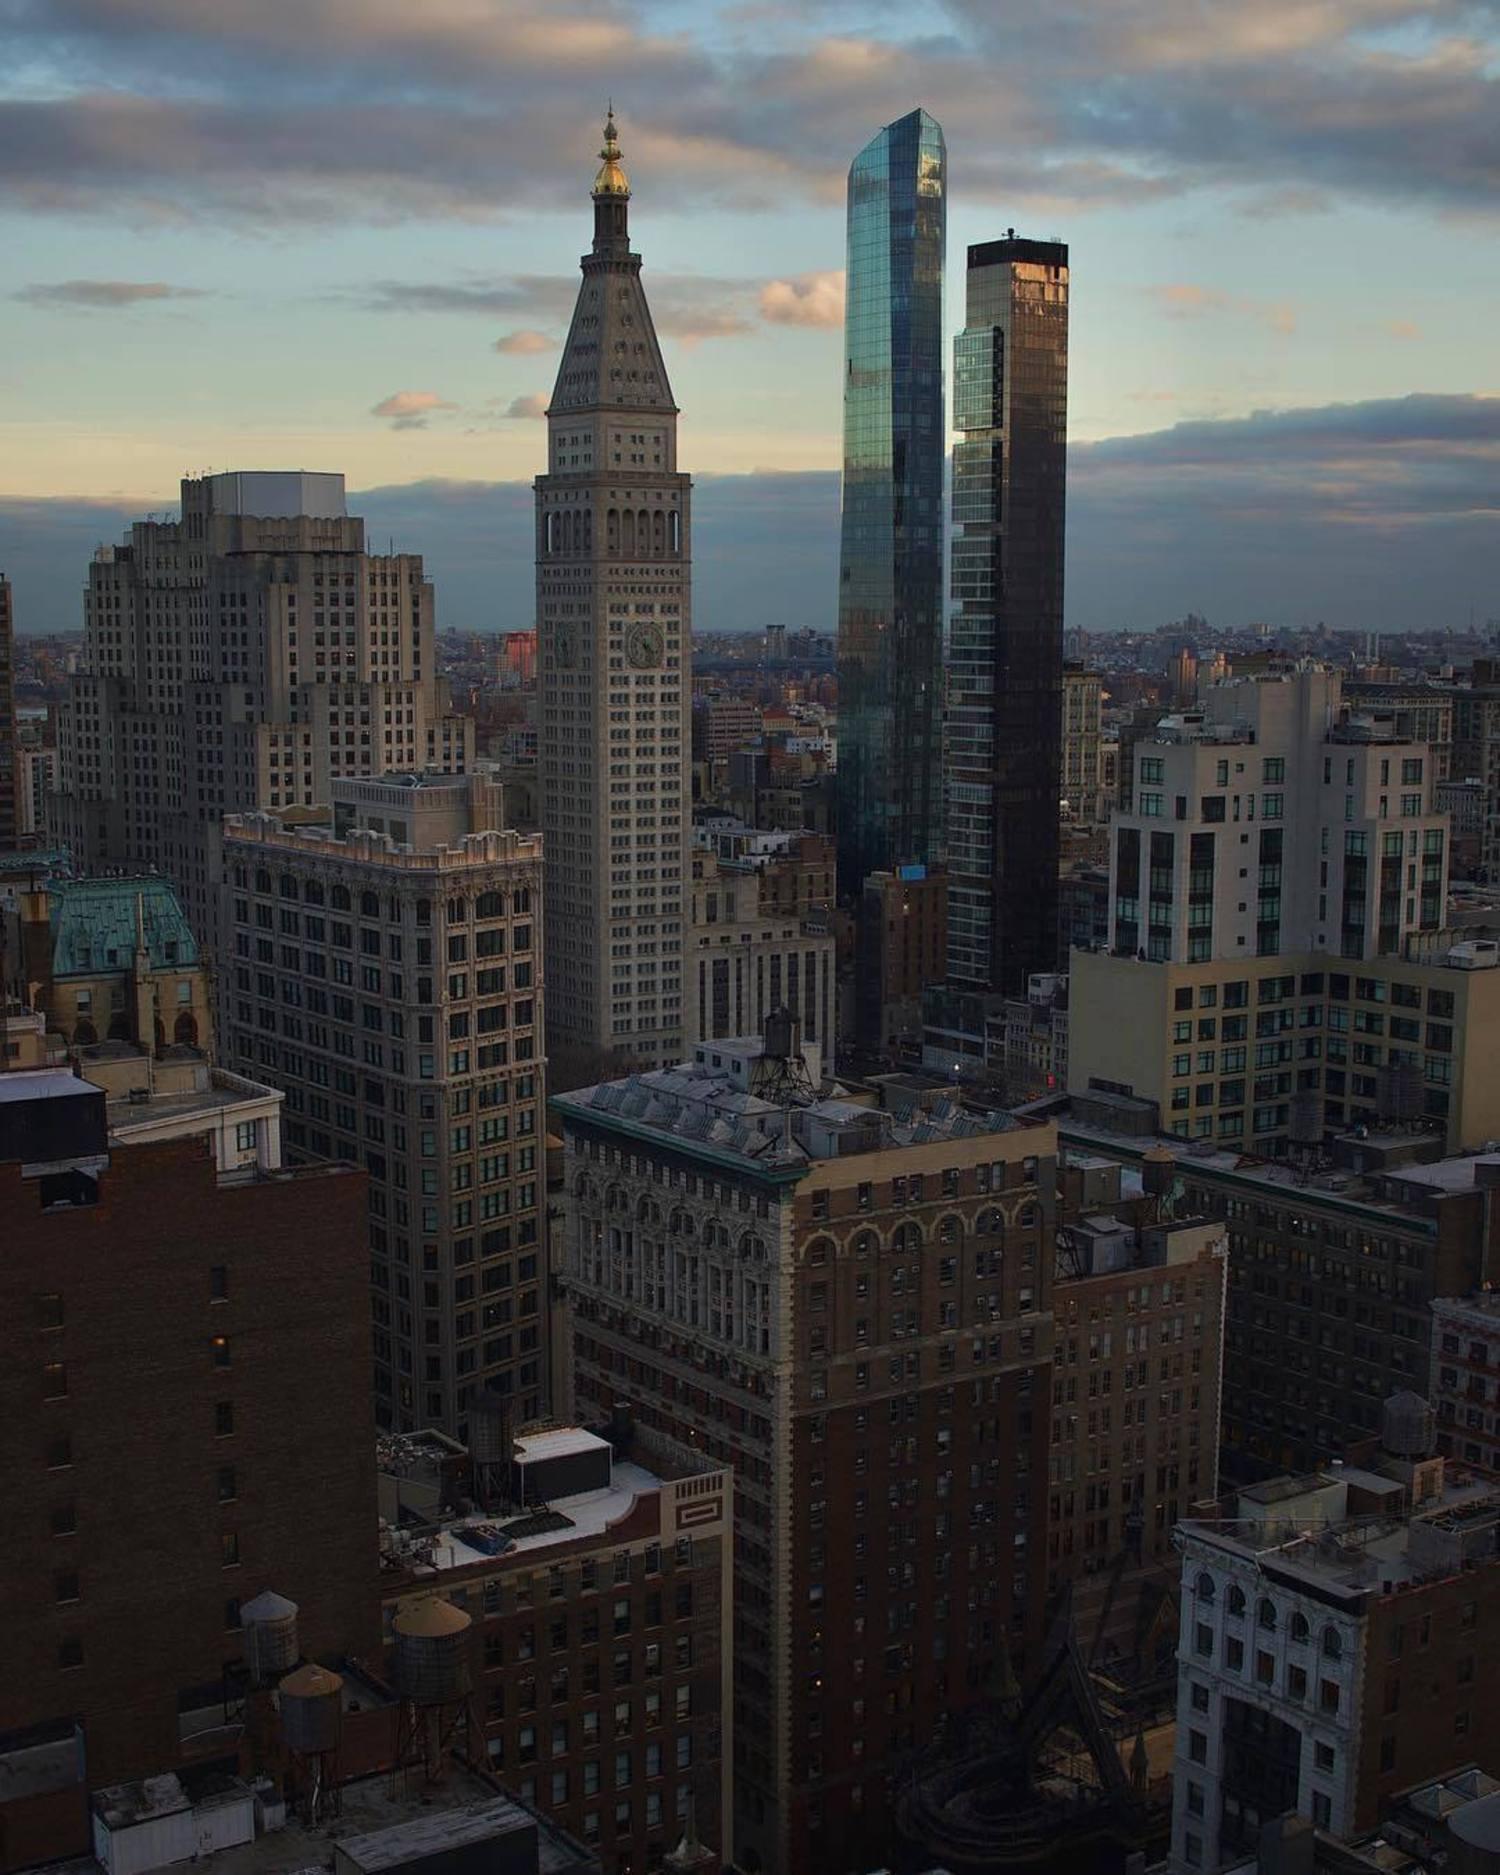 New York, New York. Photo via @m8b9 #viewingnyc #nyc #newyork #newyorkcity #flatirondistrict